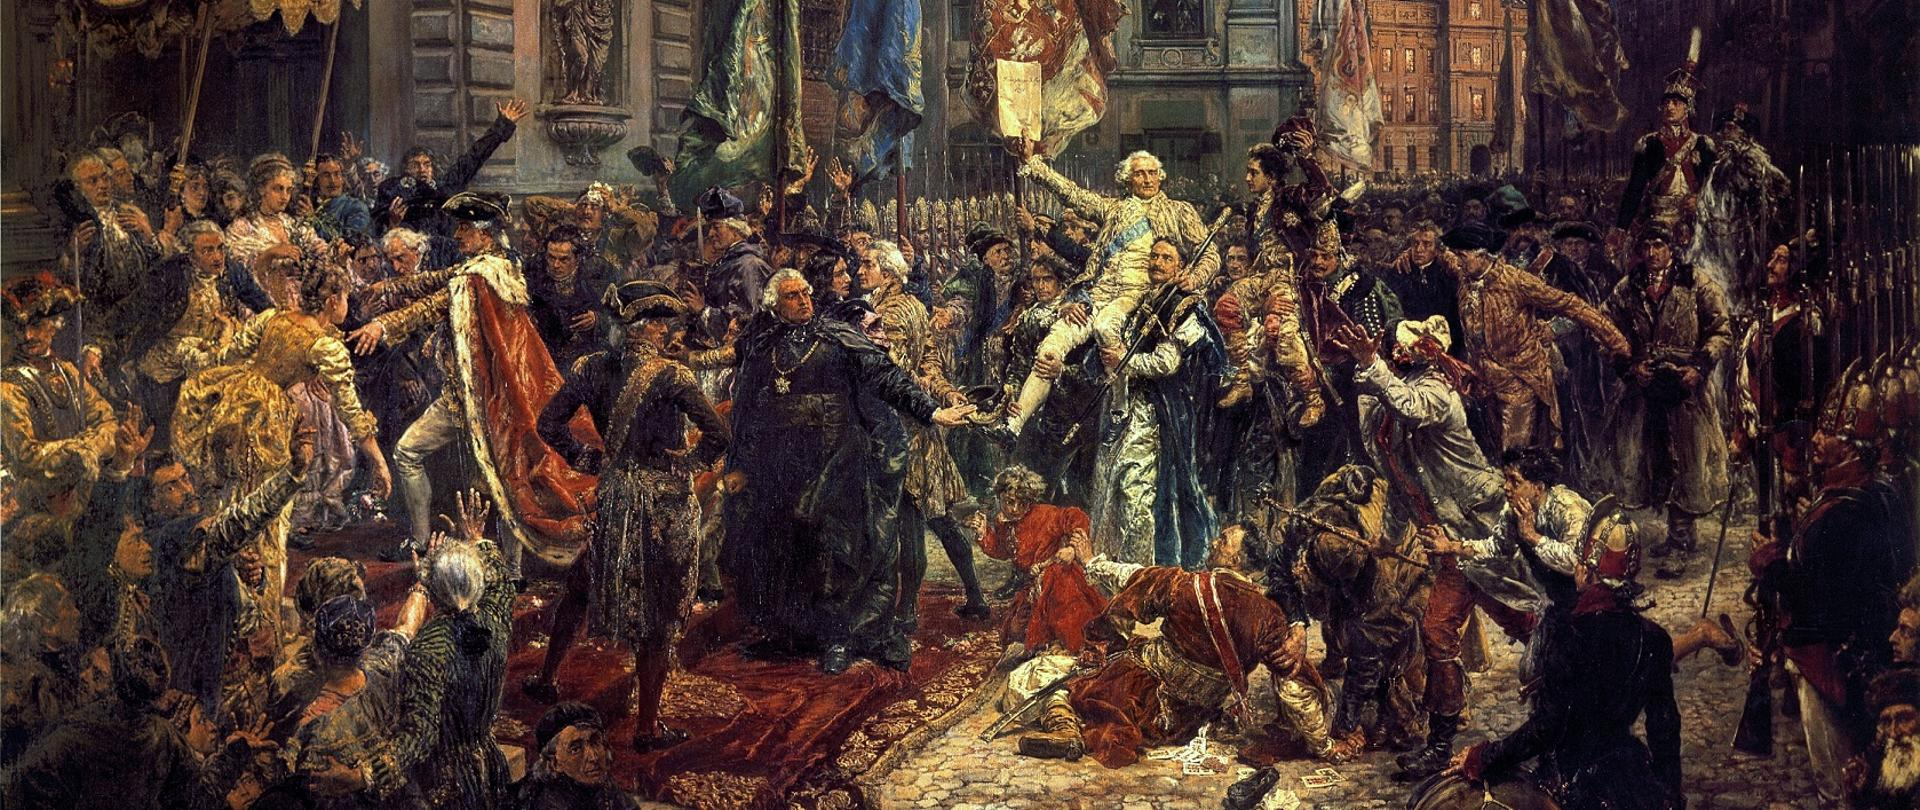 Konstytucja 3 maja - obraz Jana Matejki